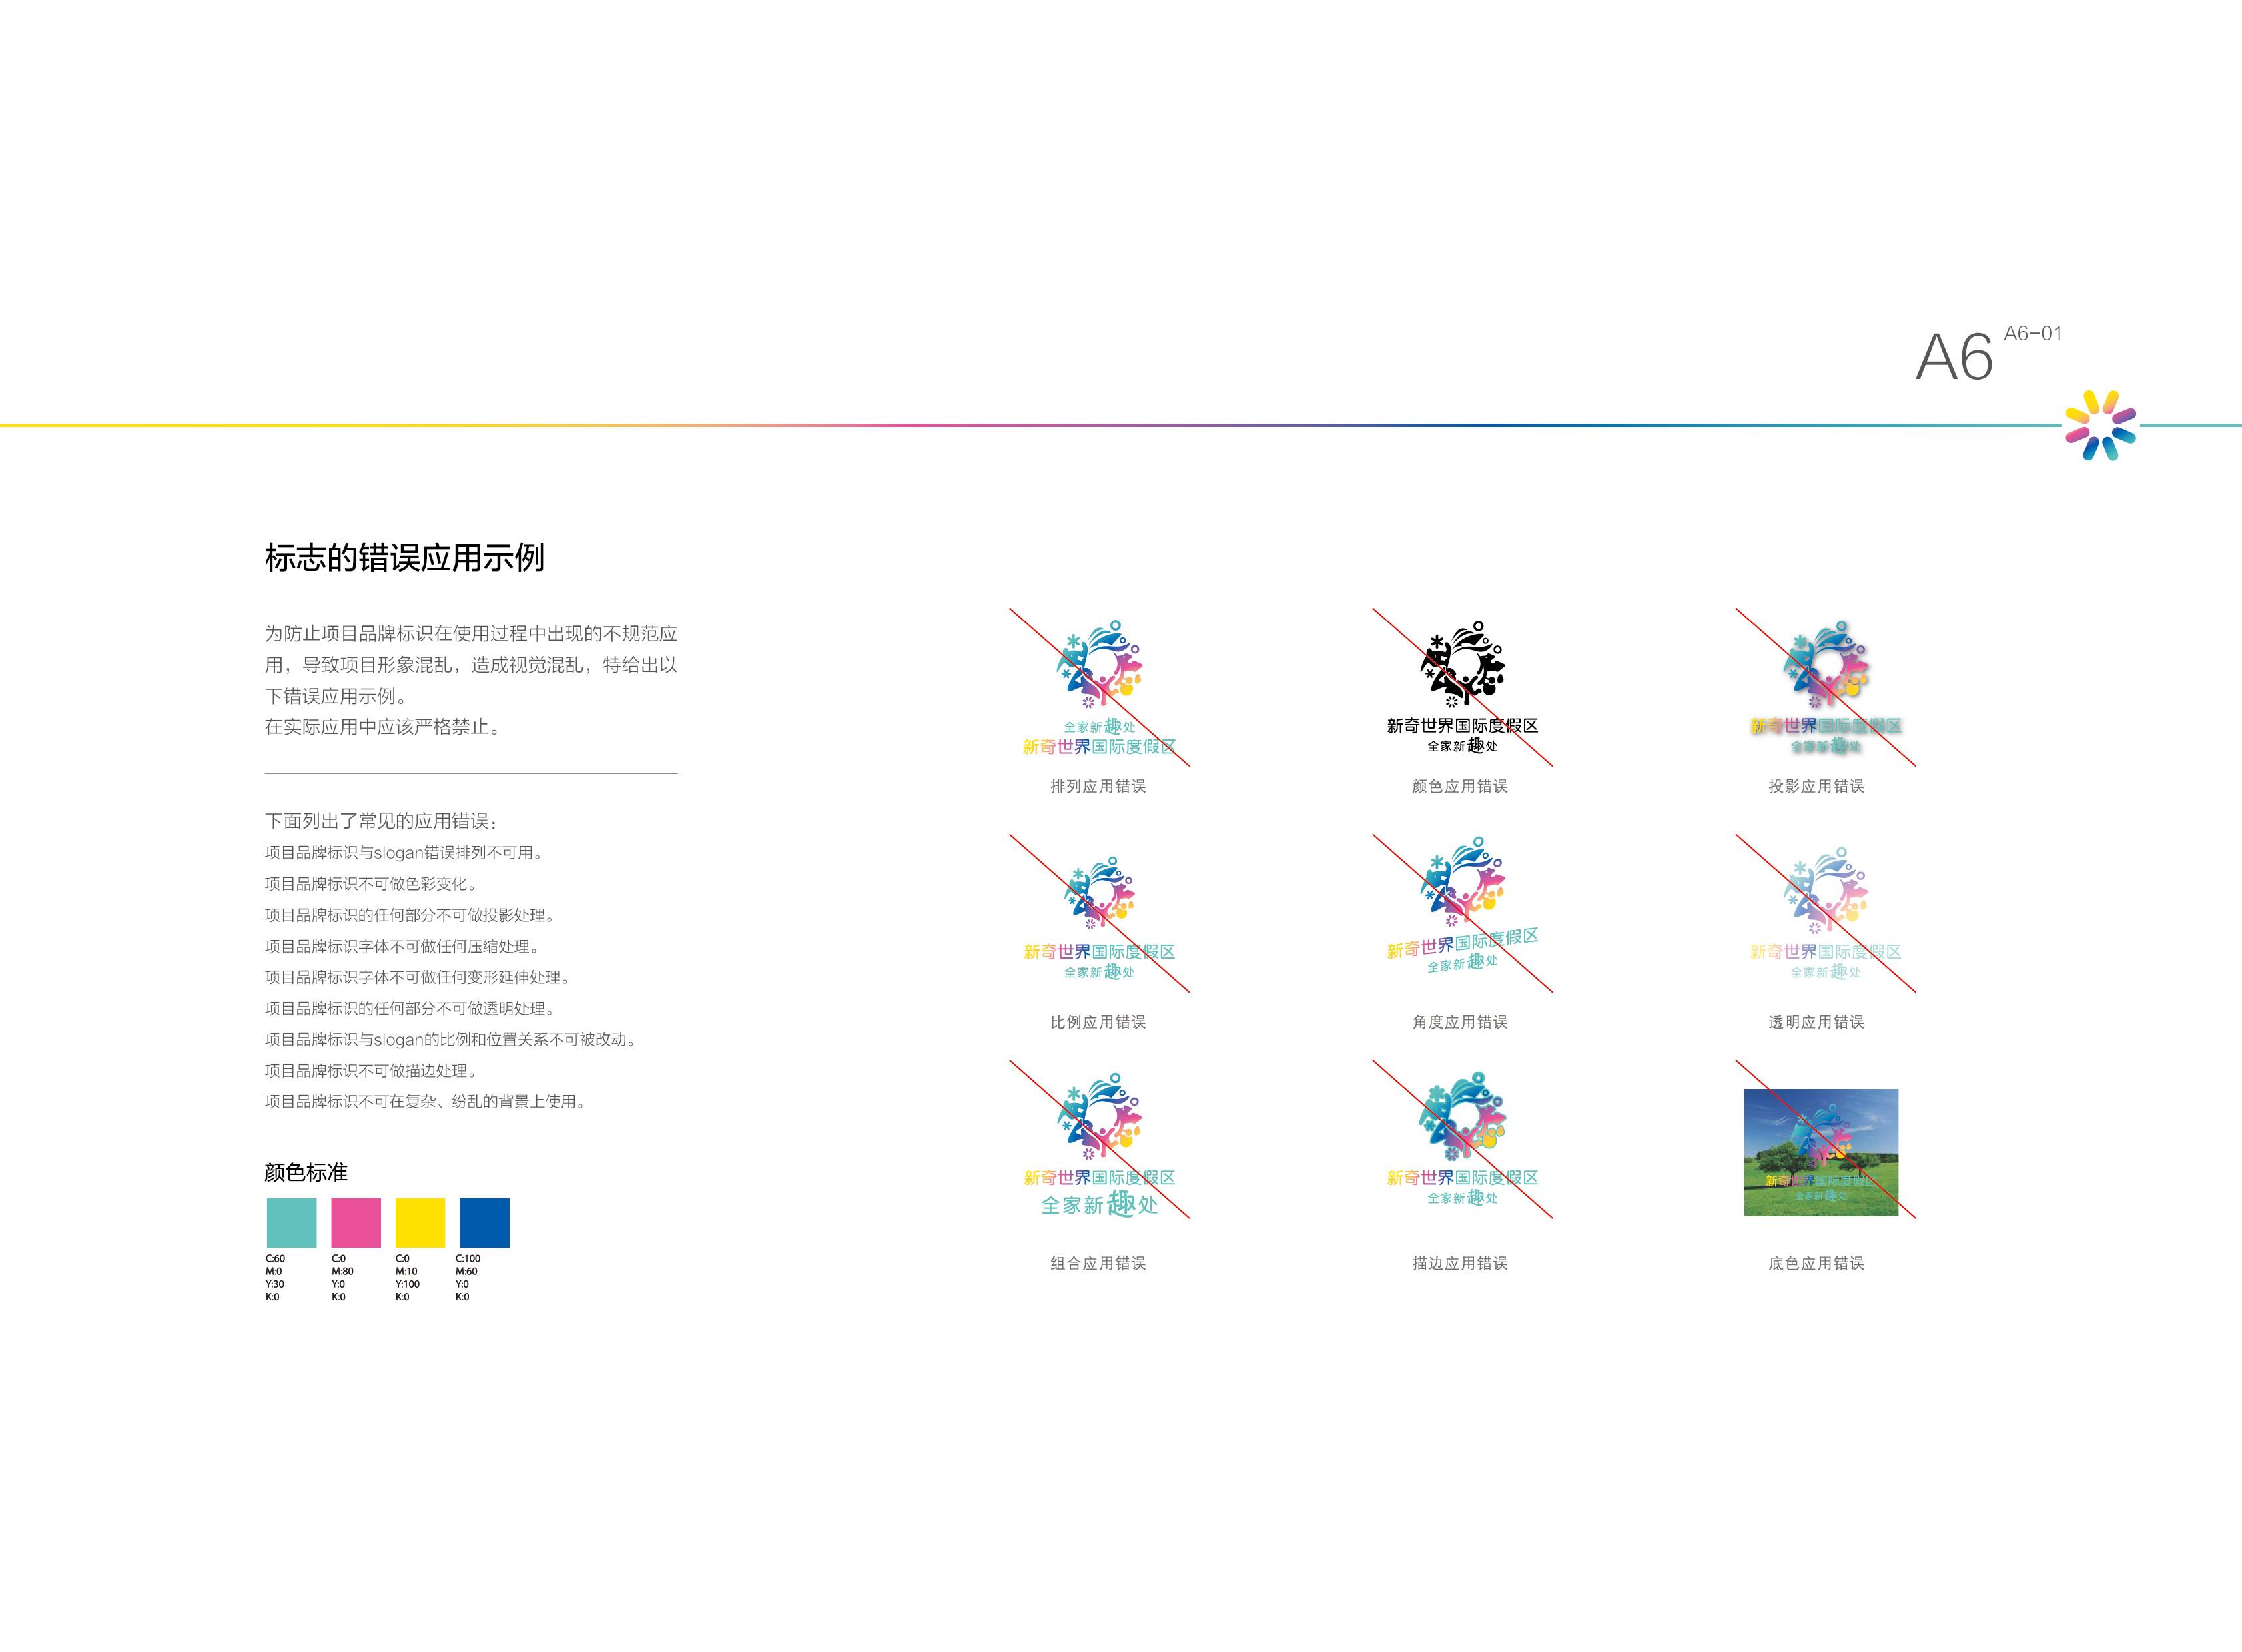 A6 应用规范.jpg